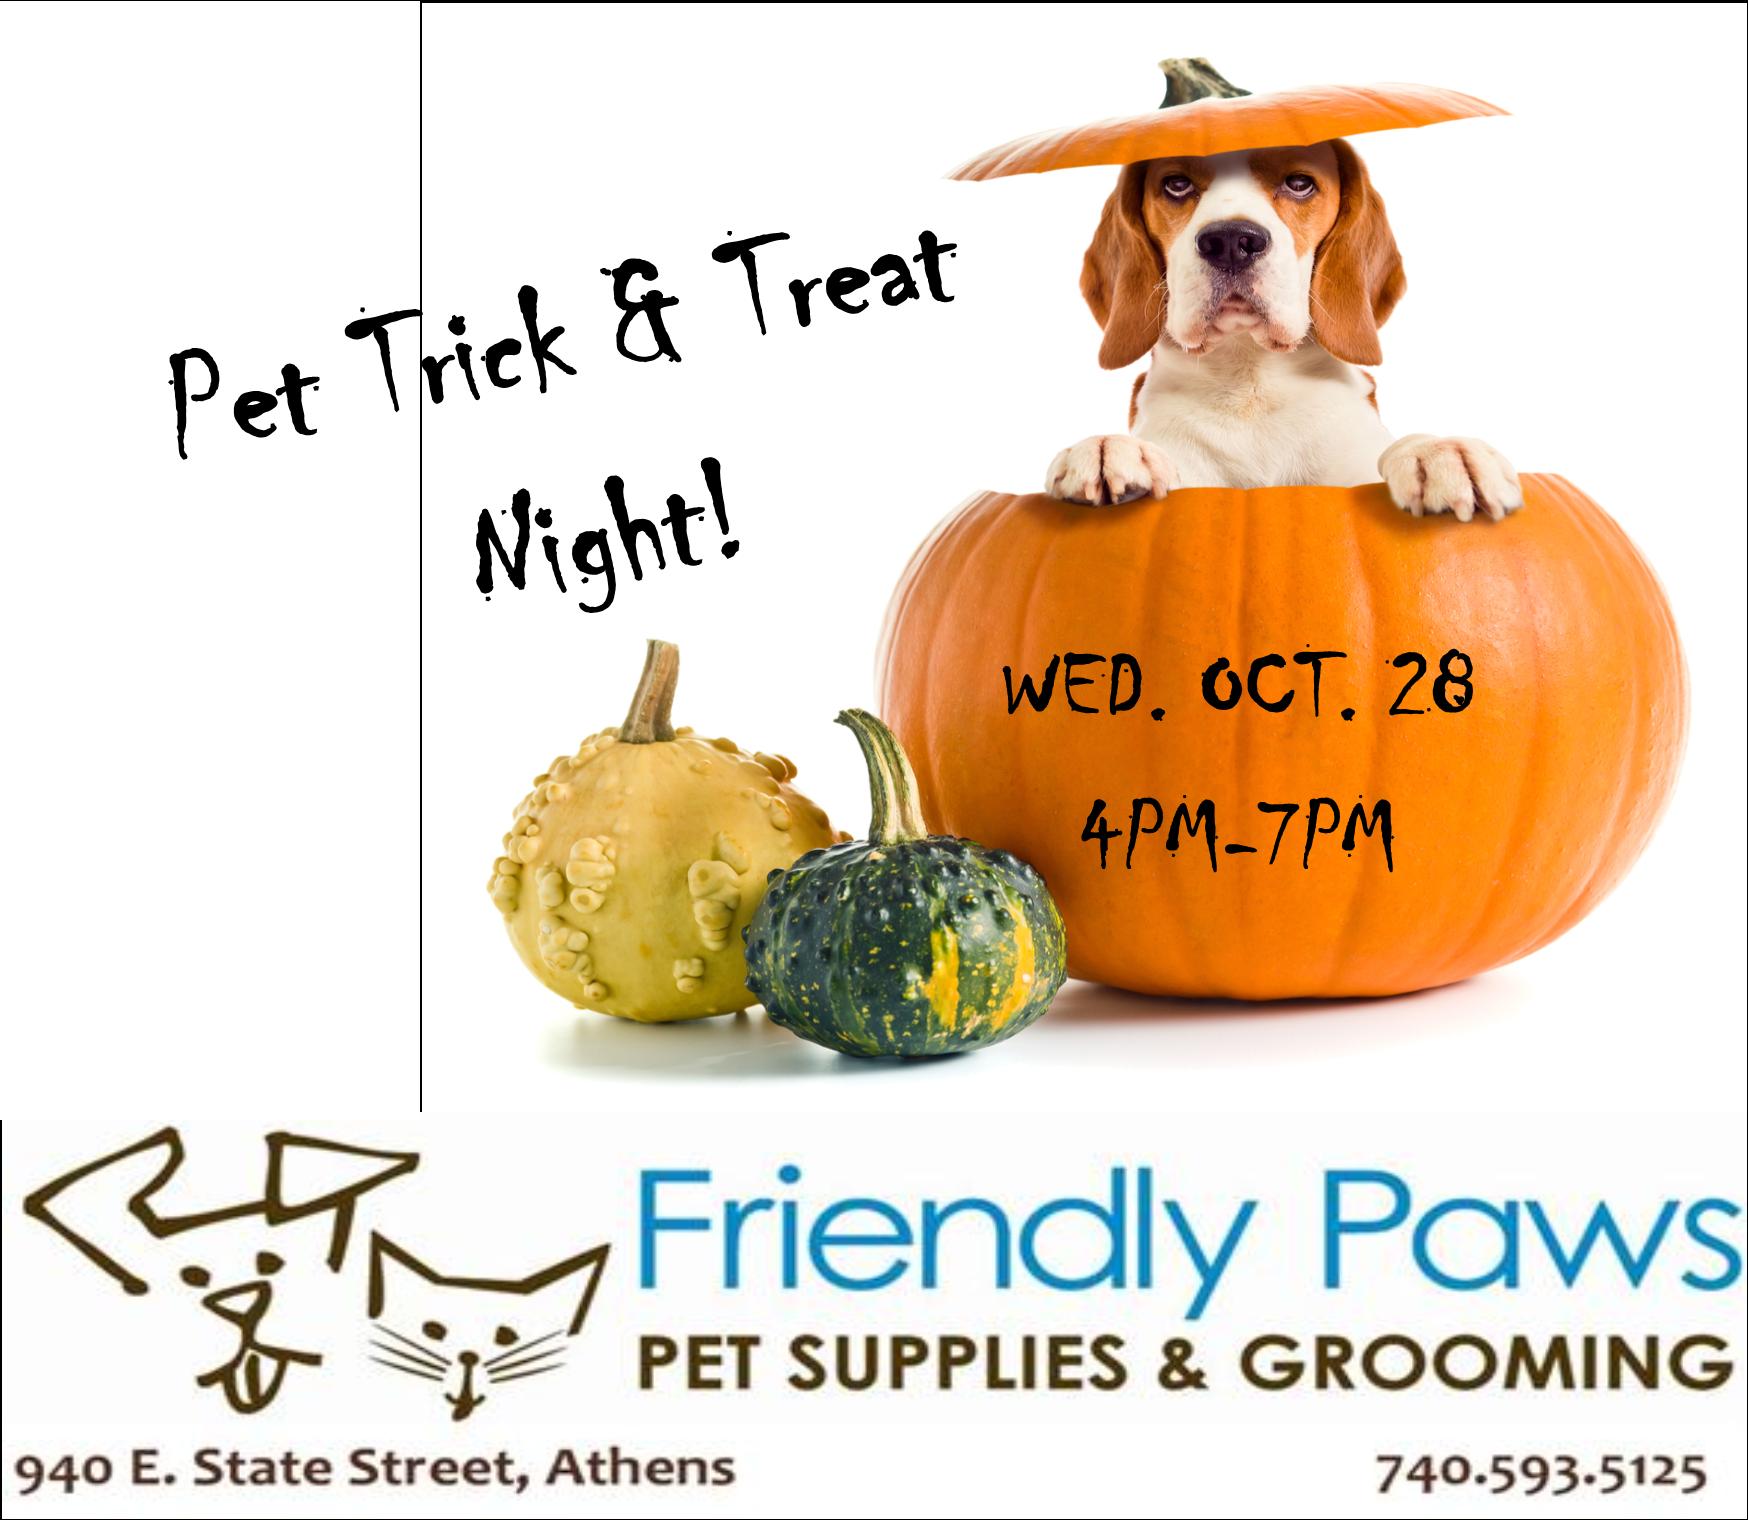 Pet Trick and Treat Night flier